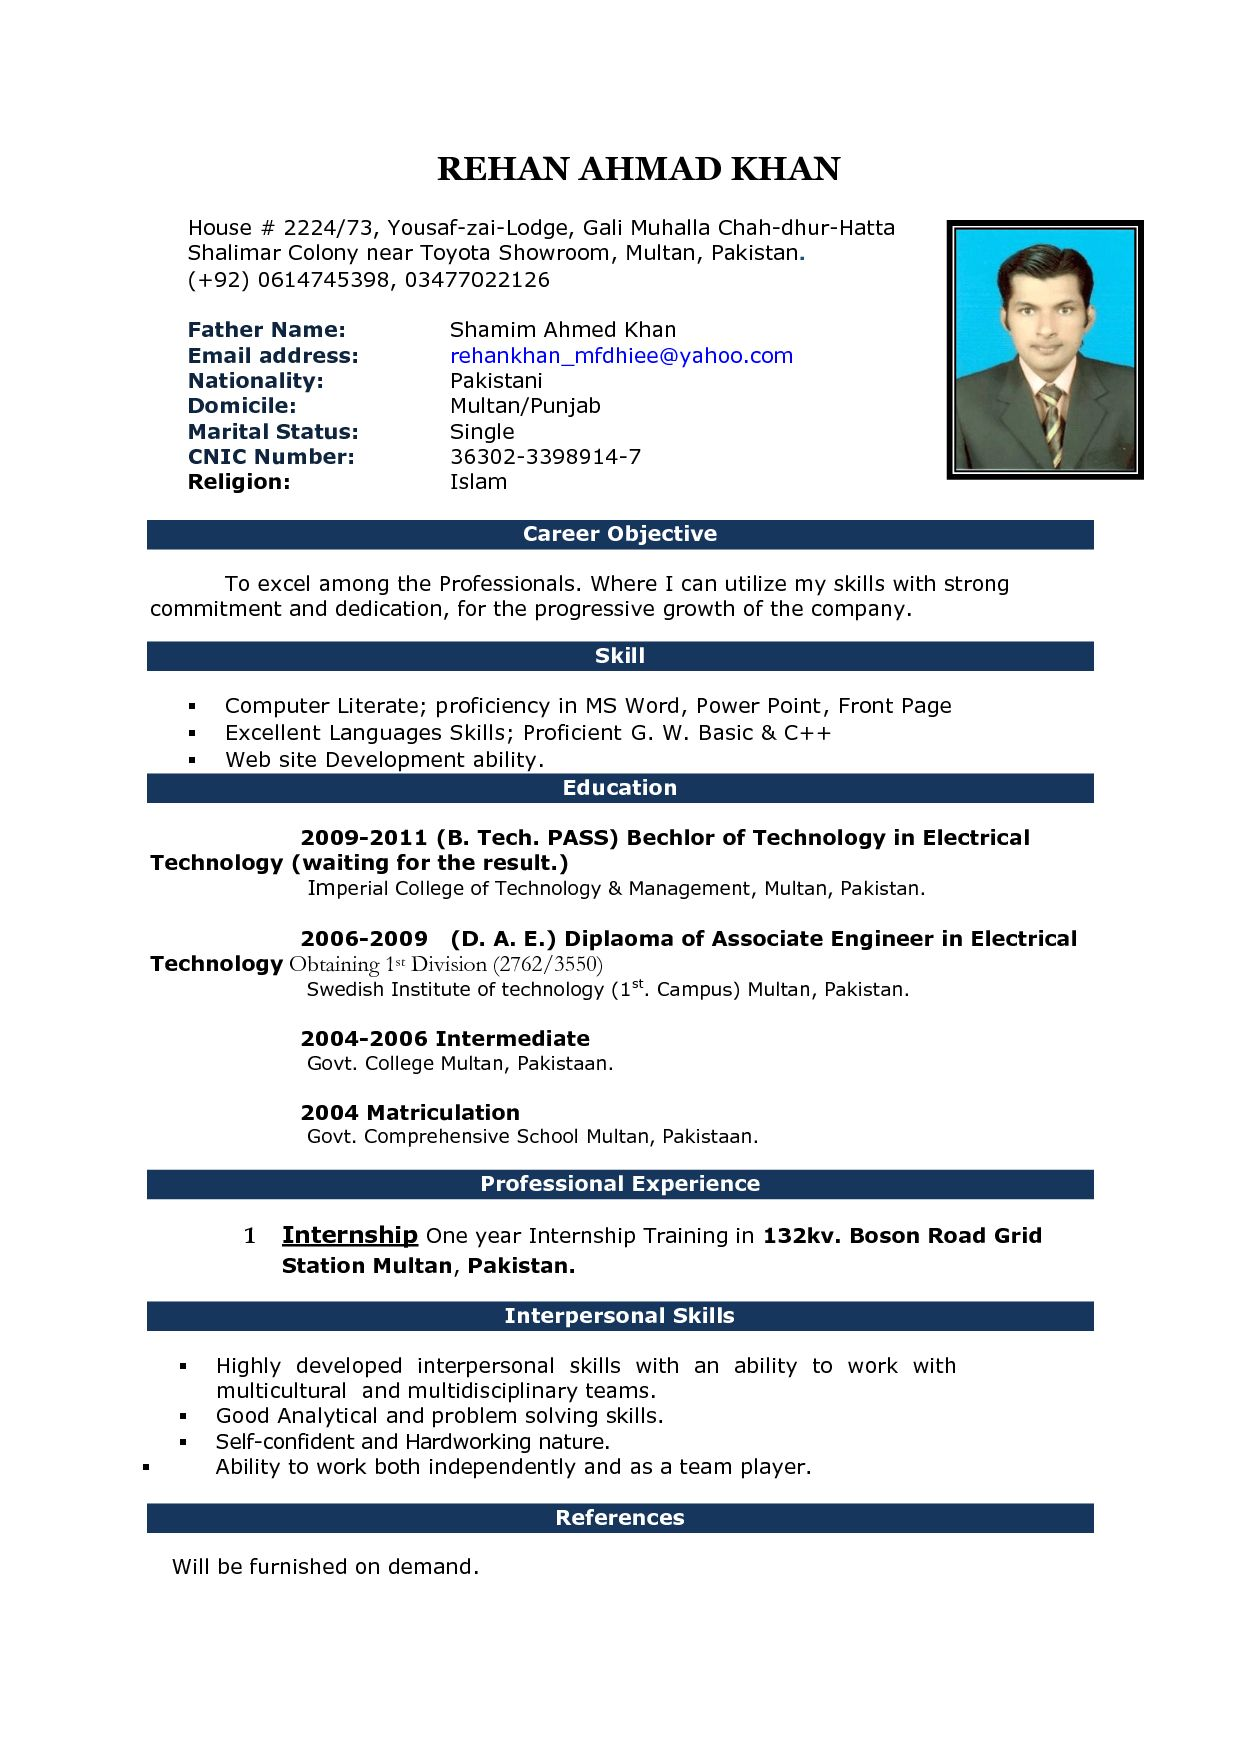 Resume Format Word File Download